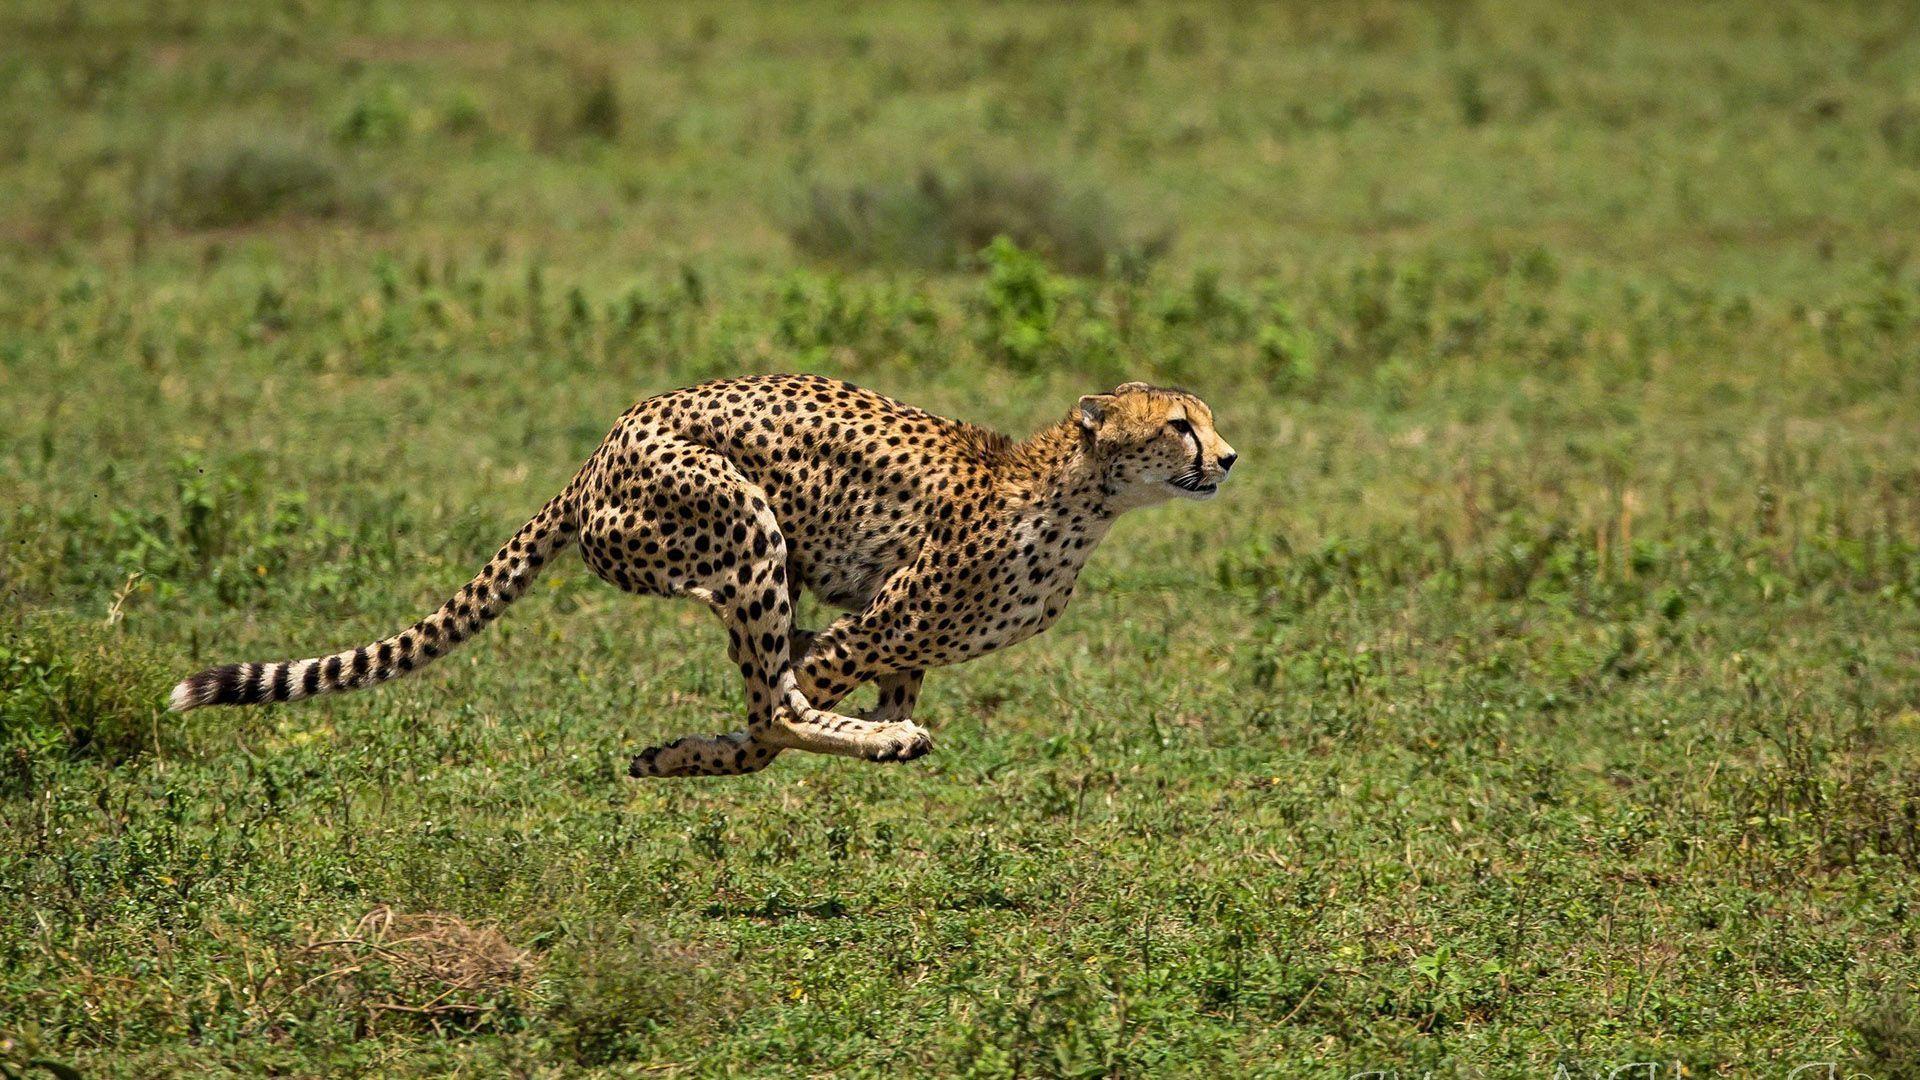 Cheetah Runs The Photo Of The Animal